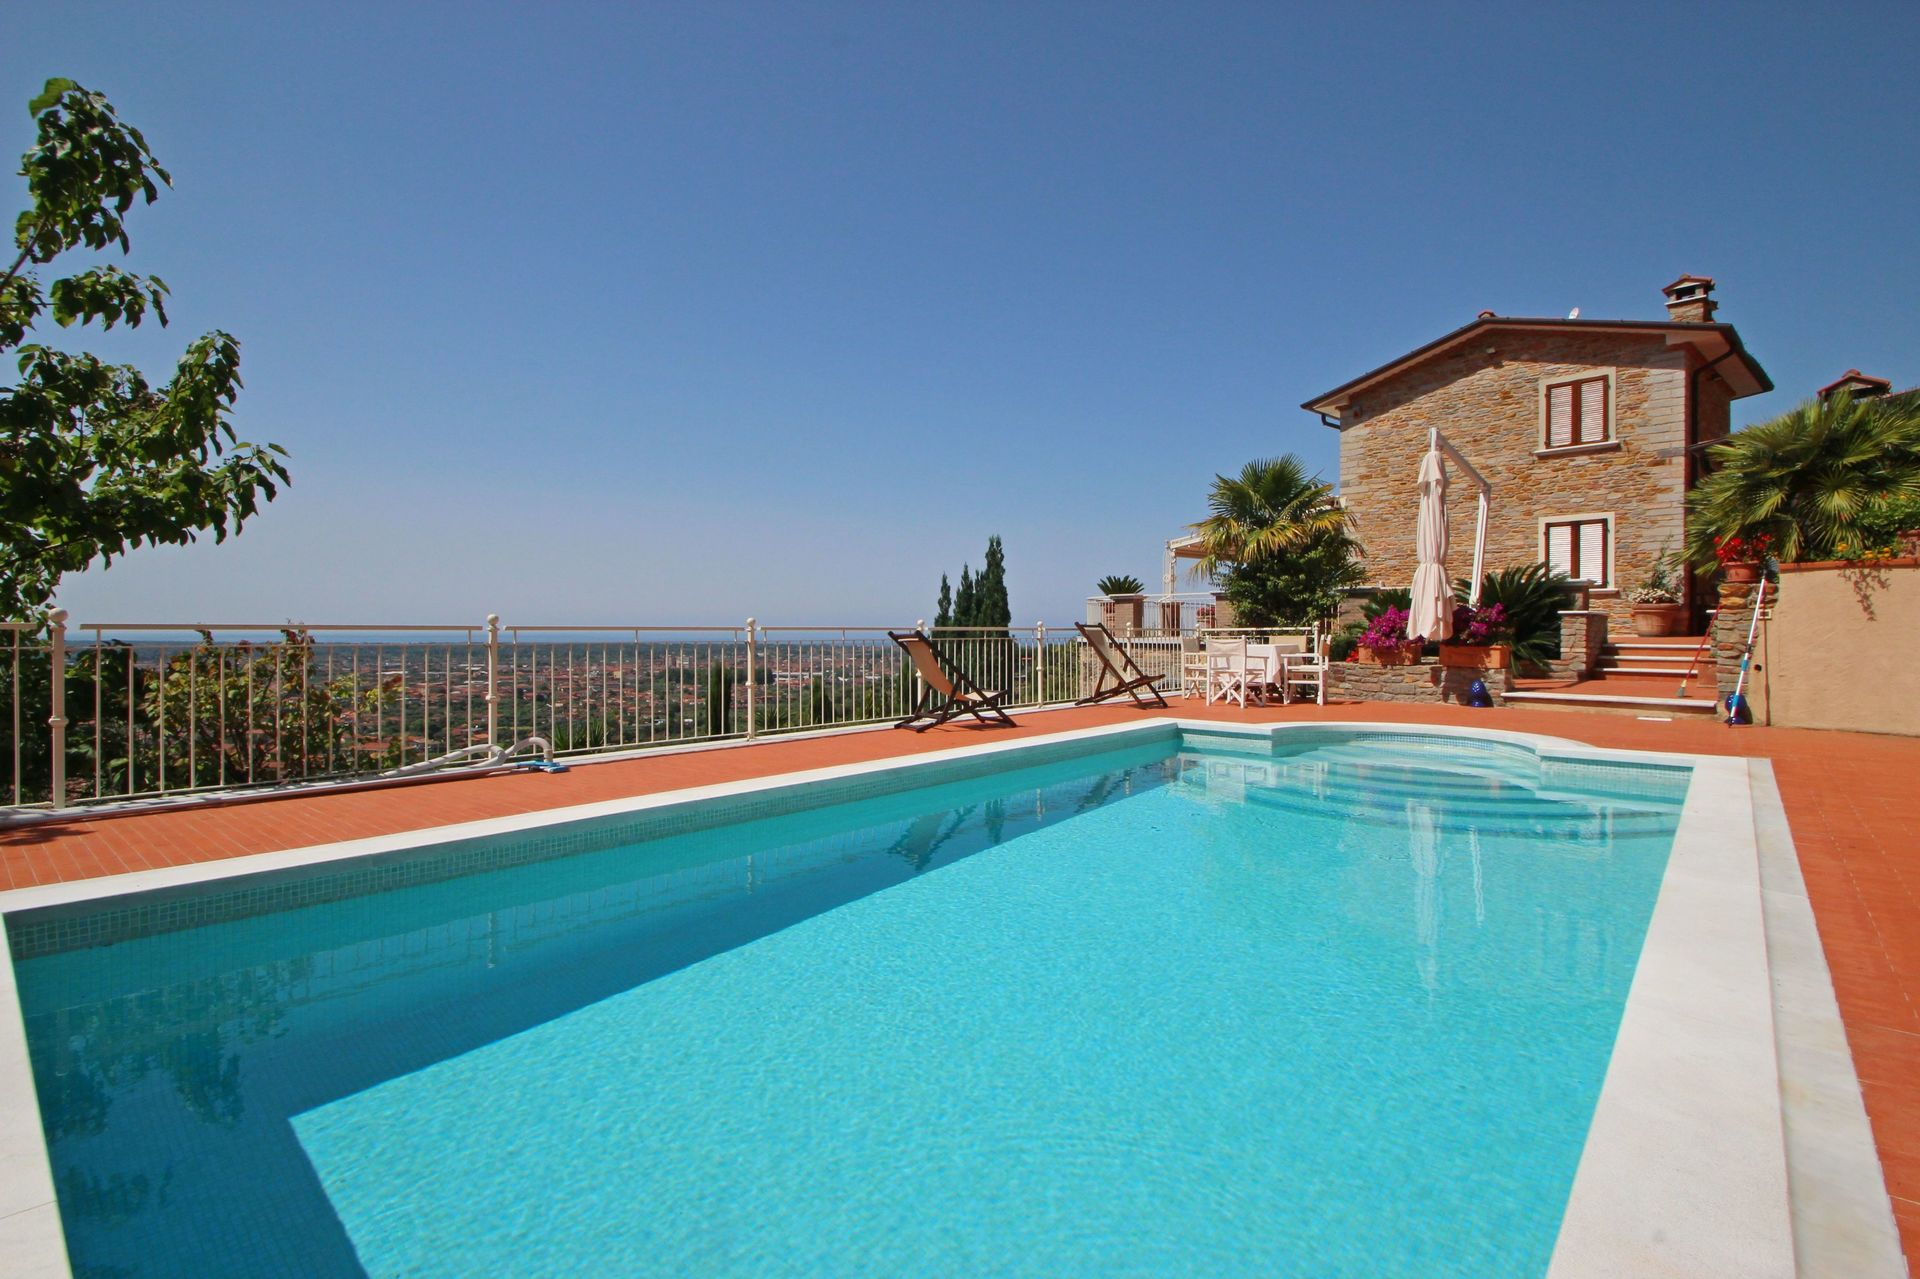 Villa Carla location de vacances - Couchages 9 dans 5 chambres